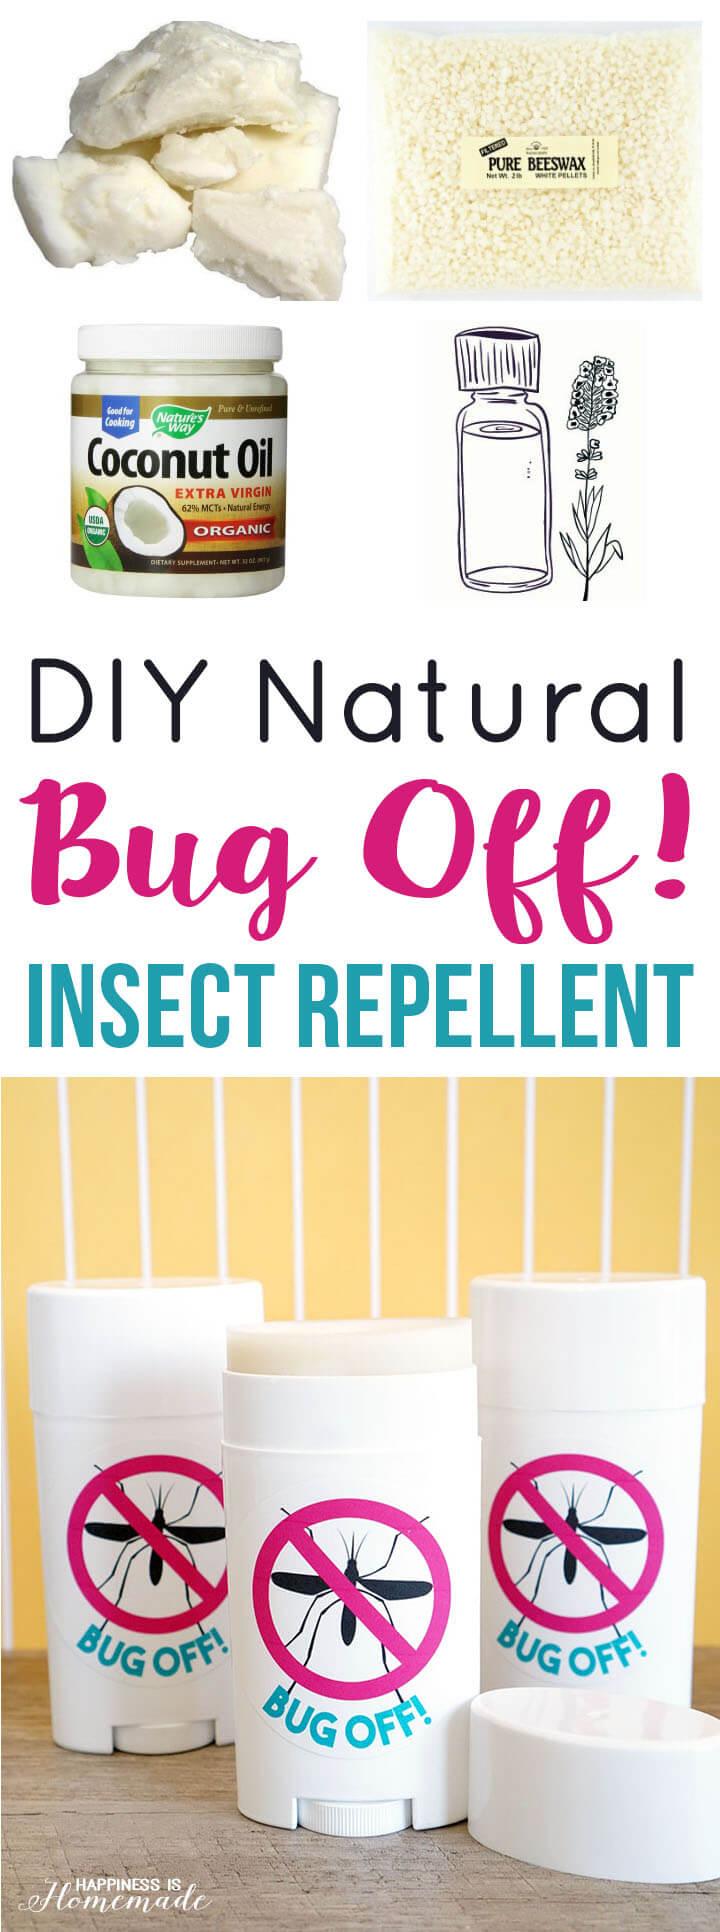 DIY Natural Bug Off Insect Repellent Sticks